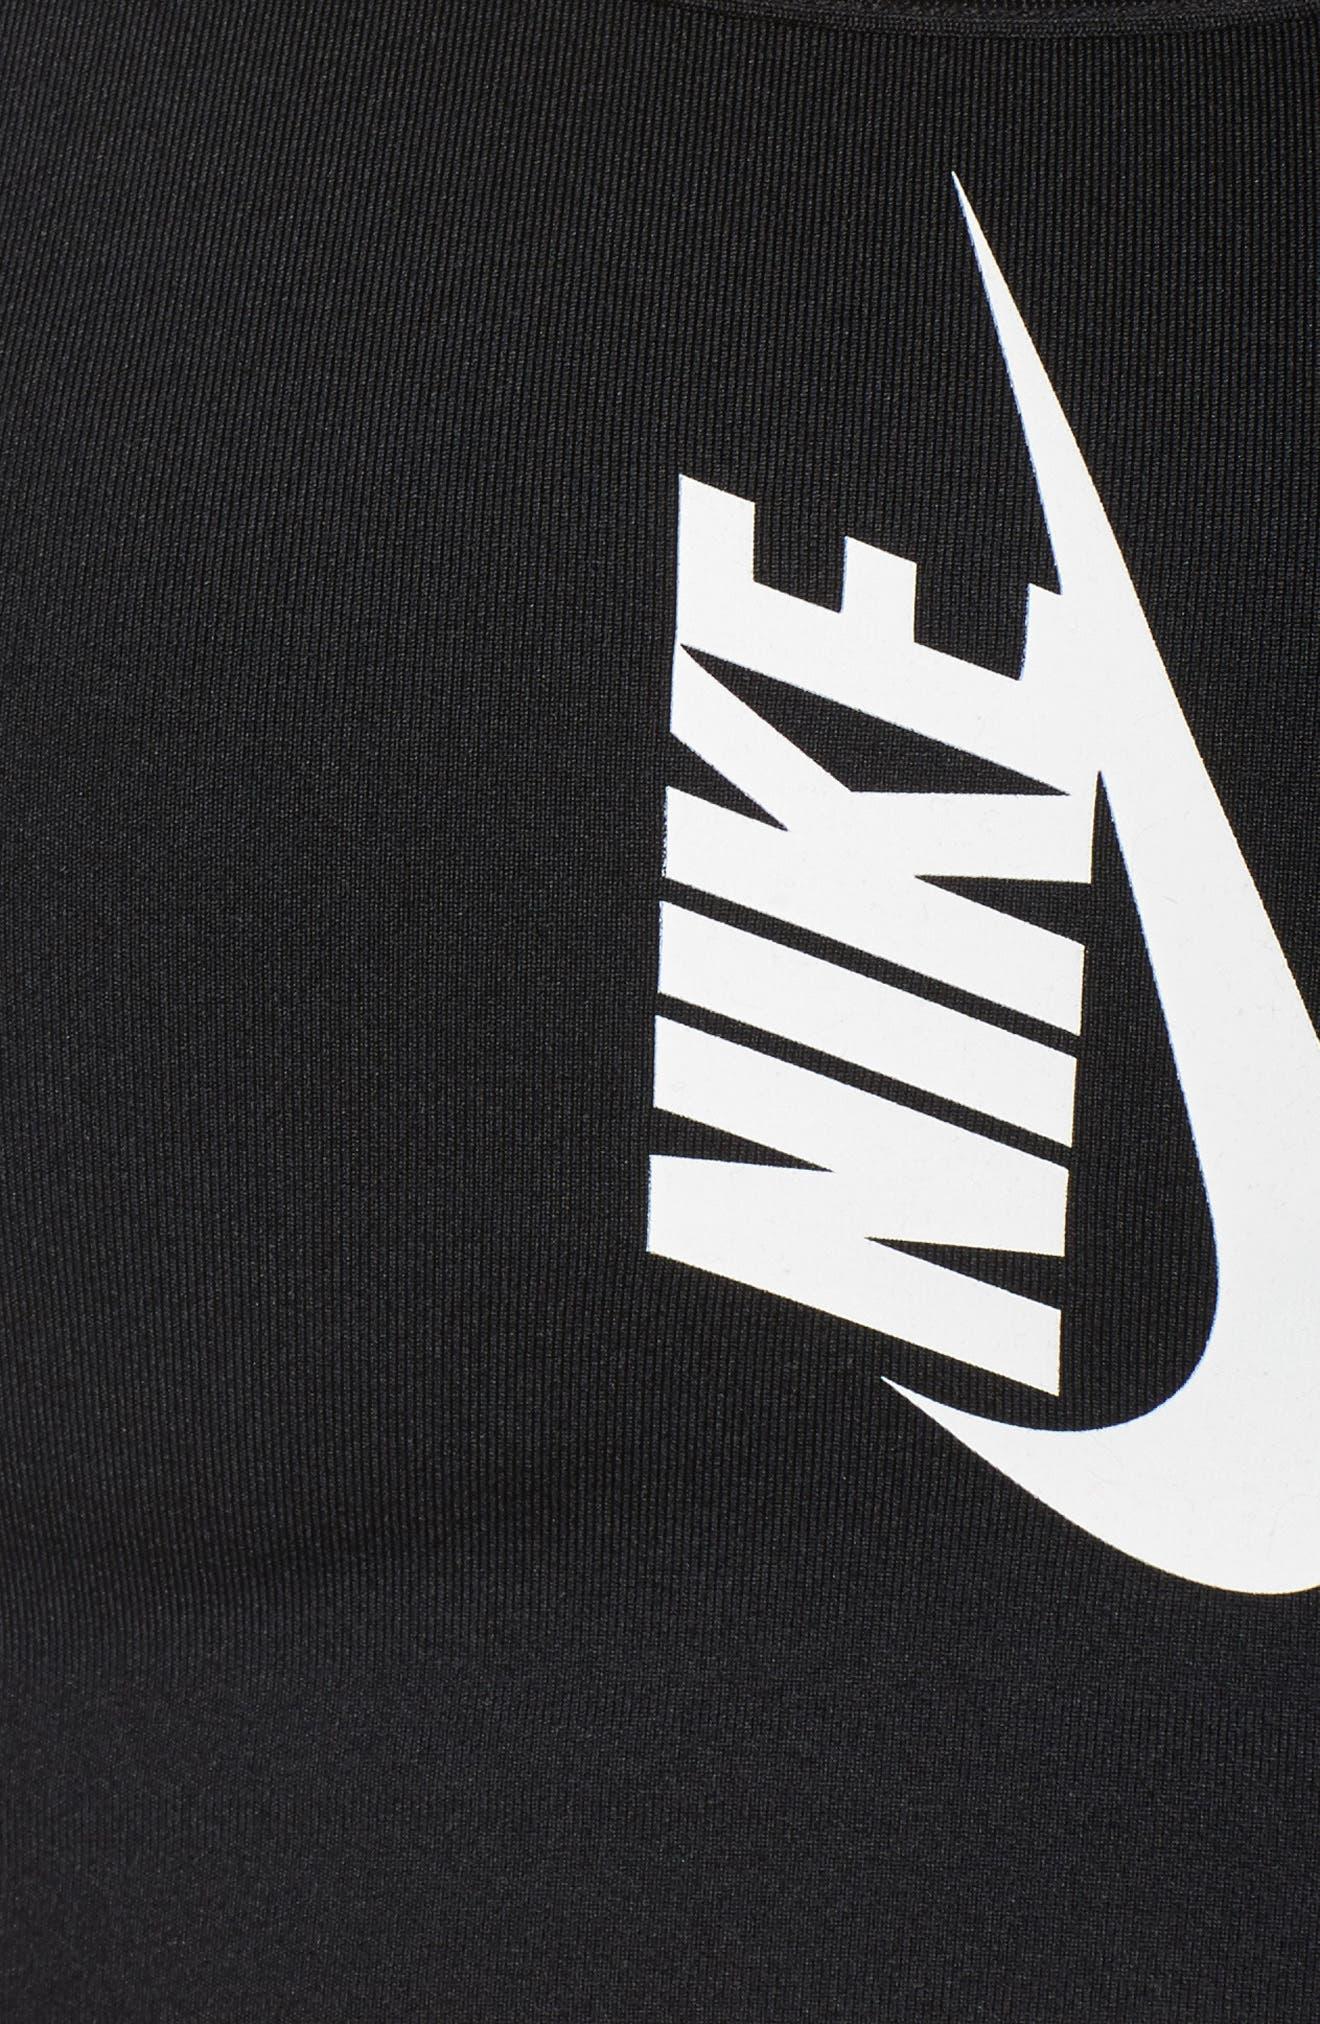 NikeLab Sports Bra,                             Alternate thumbnail 6, color,                             BLACK/ WHITE